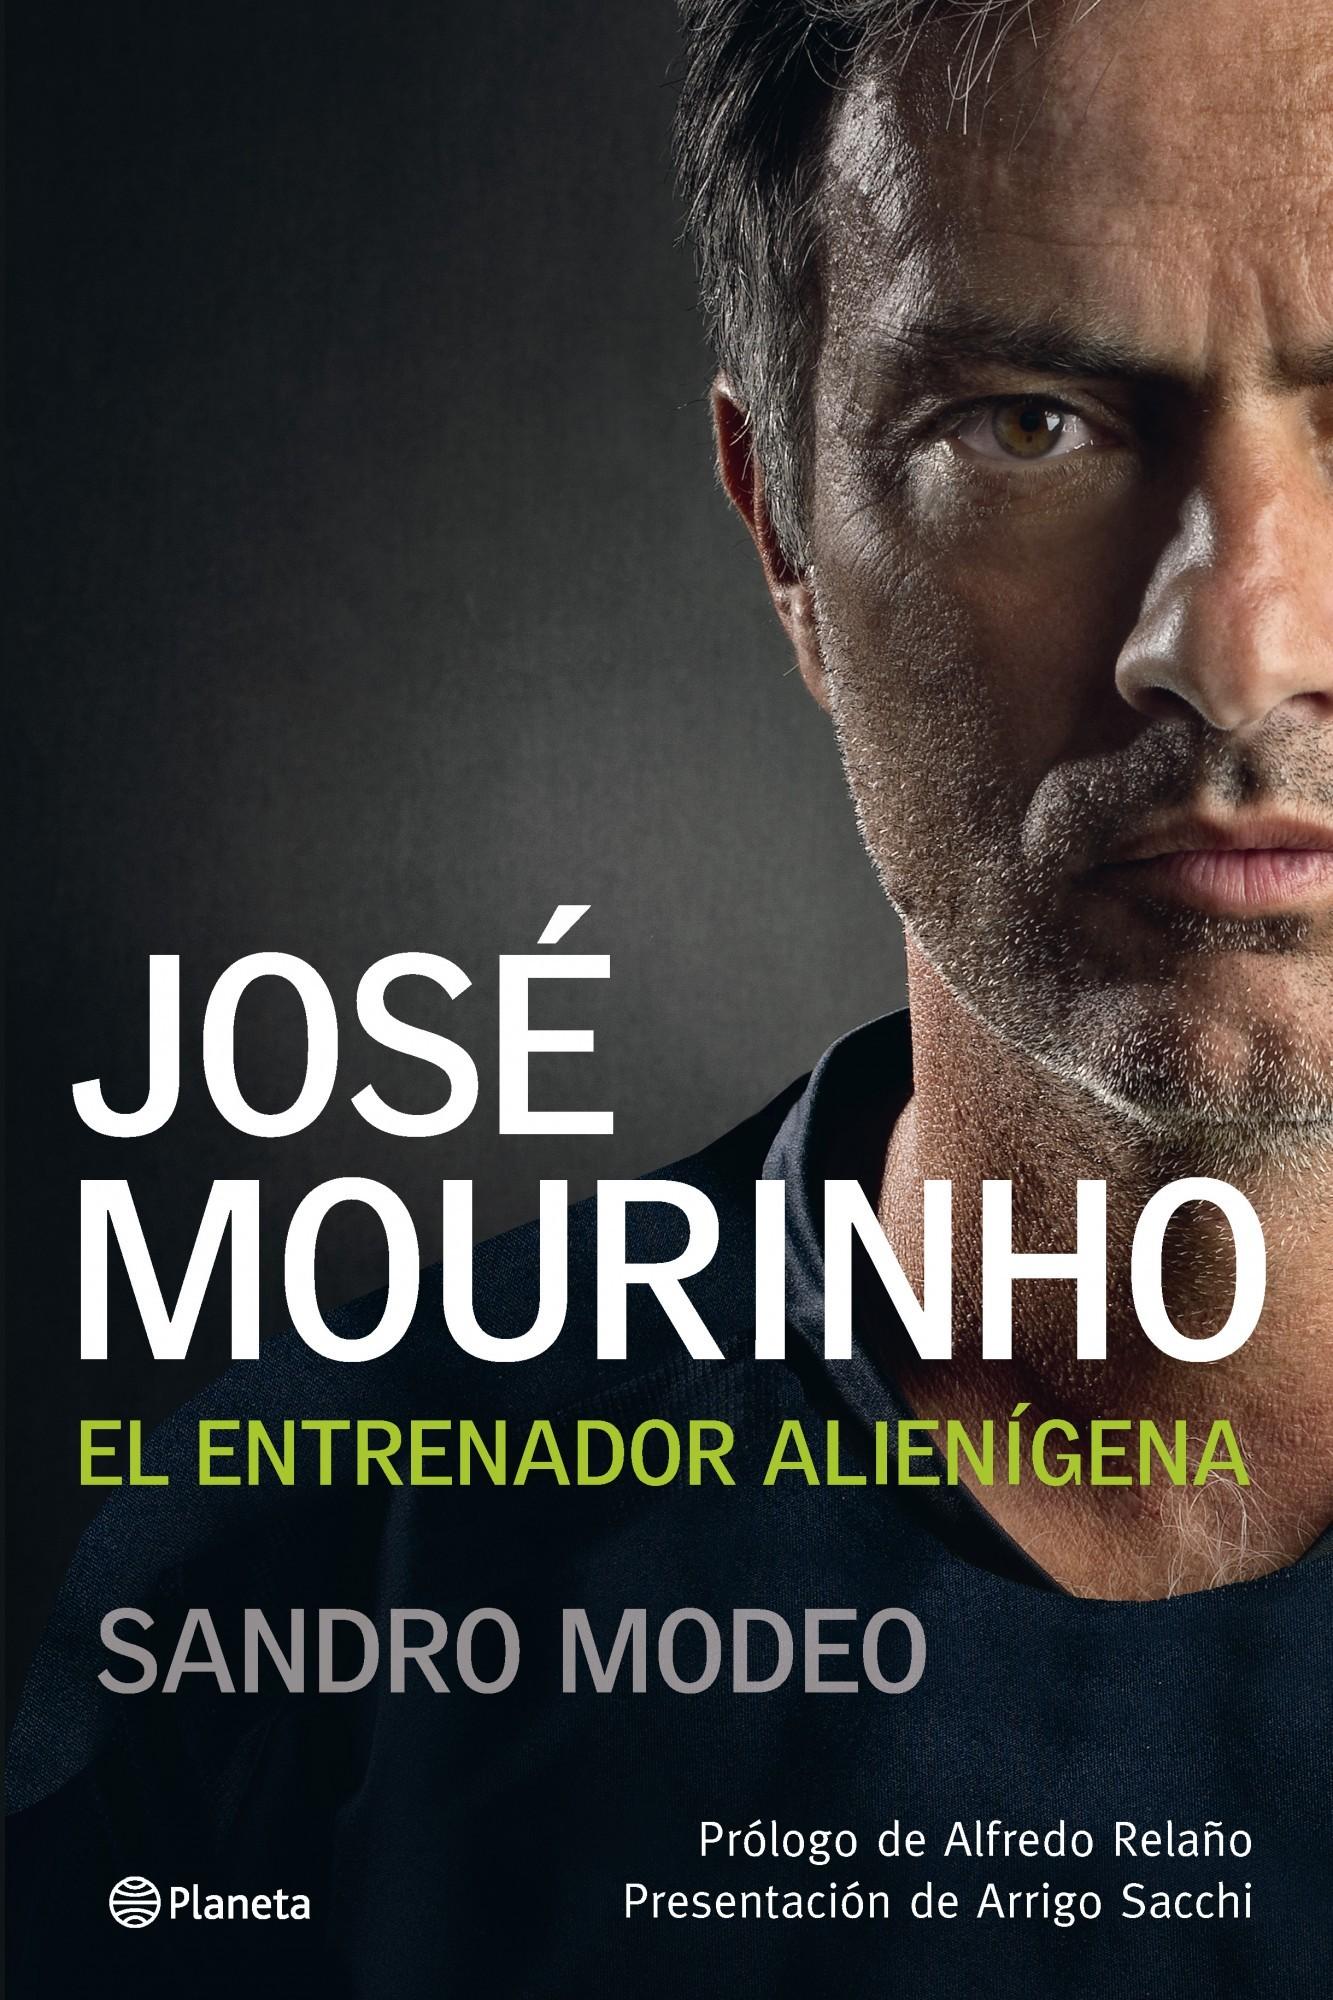 JOSÉ MOURINHO: VINI, VIDI, VINCI. EL ENTRENADOR ALIENÍGENA